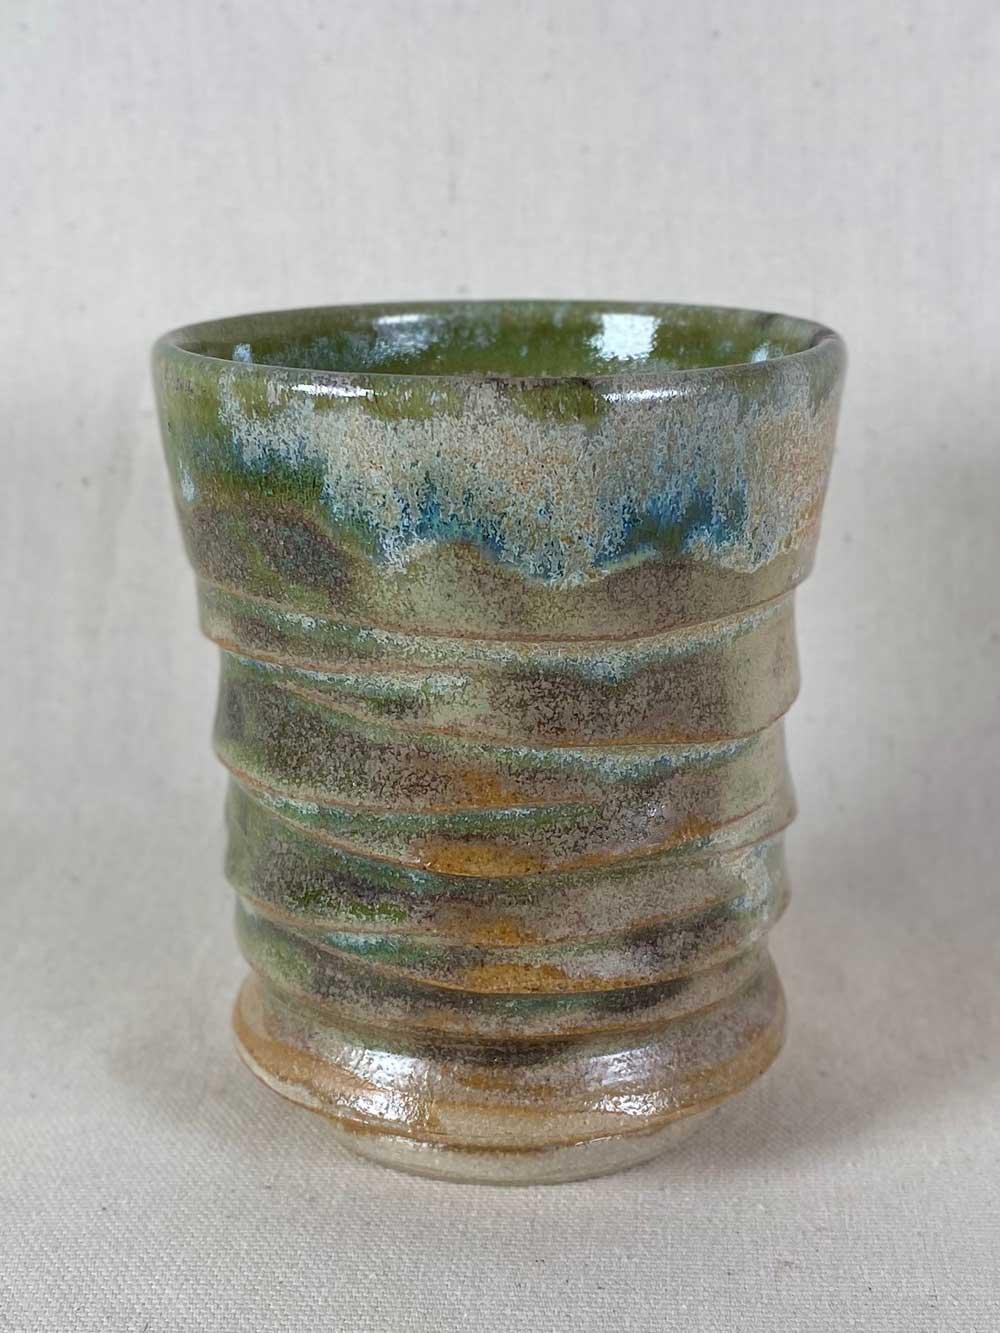 bespoke stoneware tea bowl by gary wood